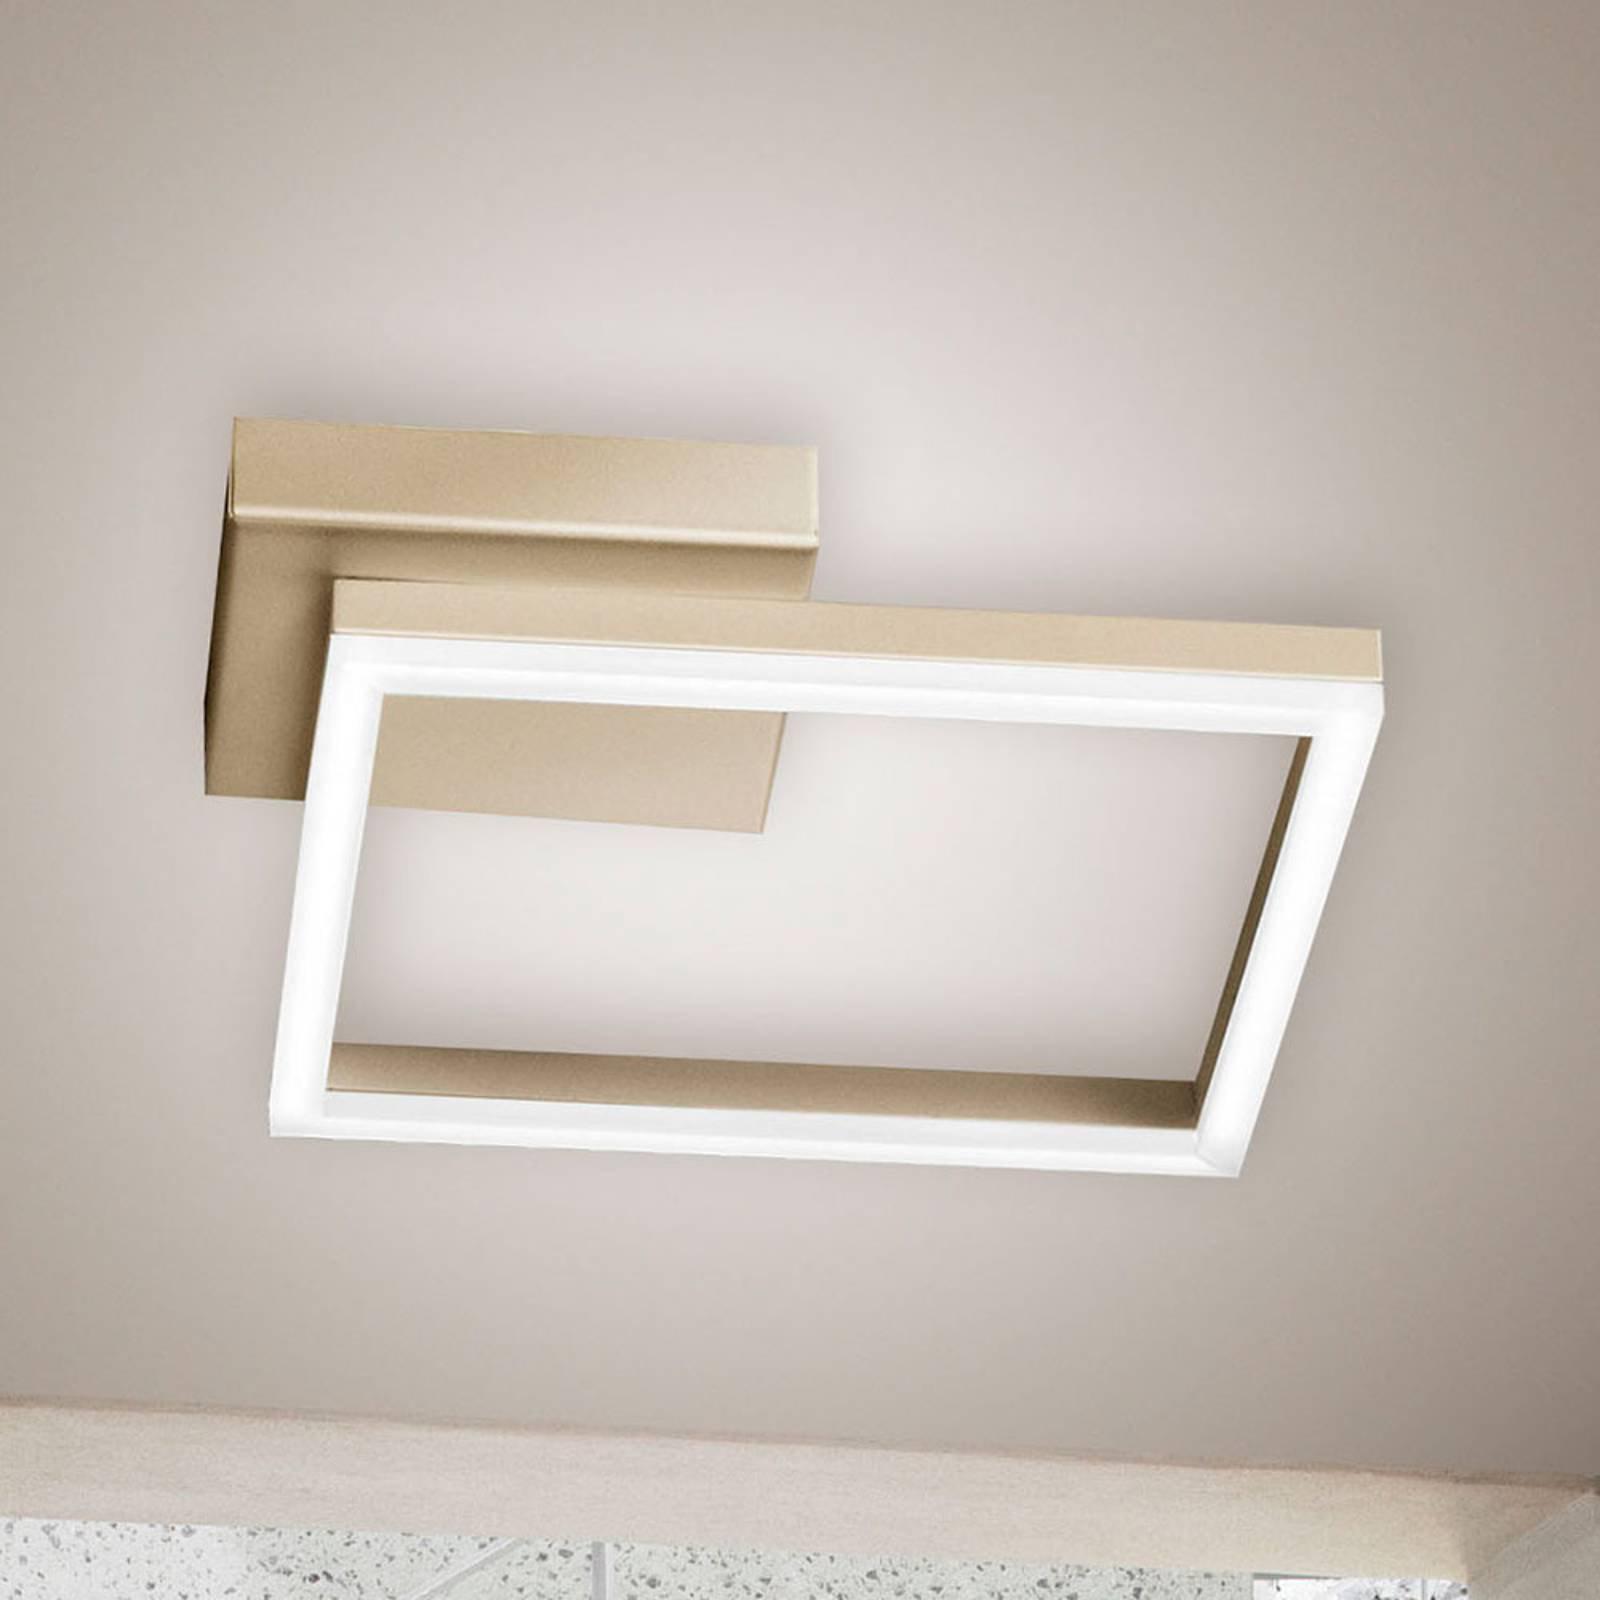 LED-taklampe Bard, 27x27cm, matt gull-finish